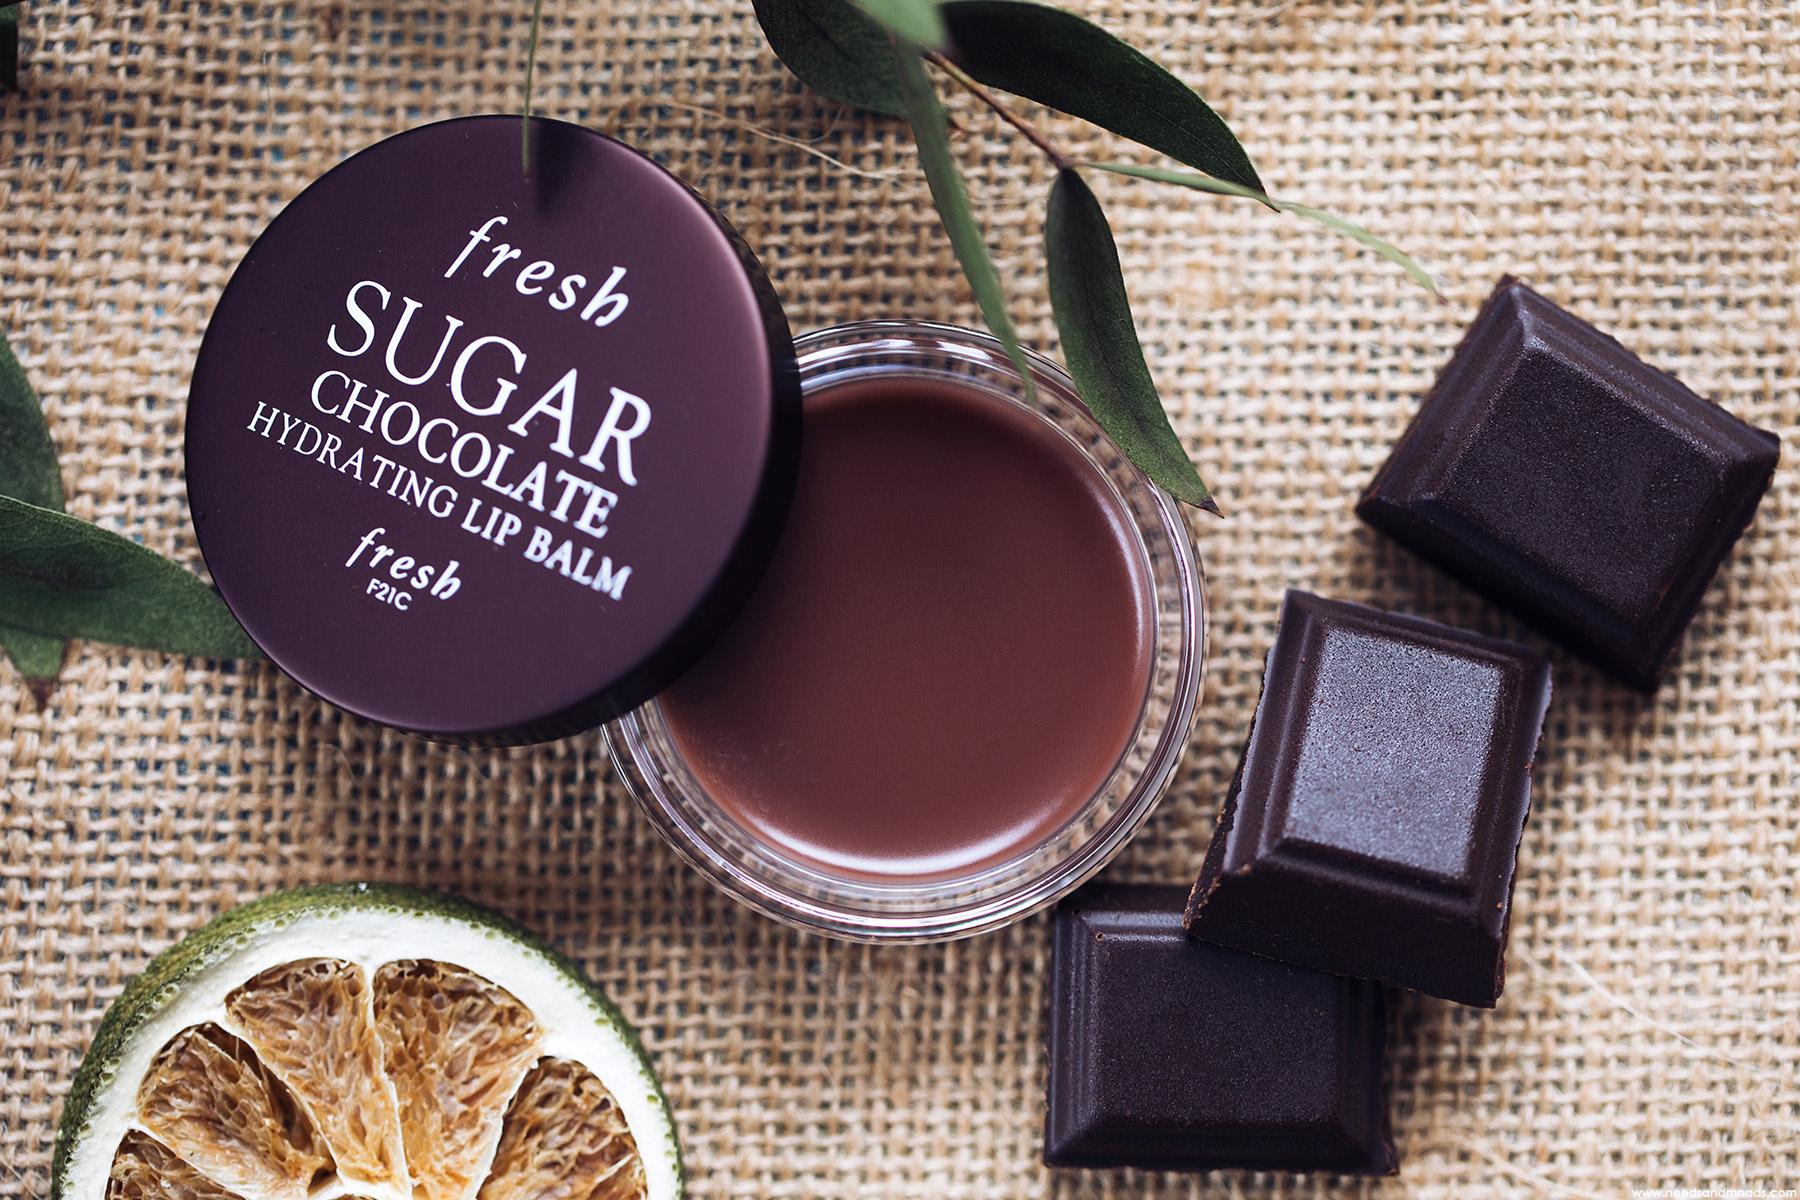 fresh sugar baume levres chocolat